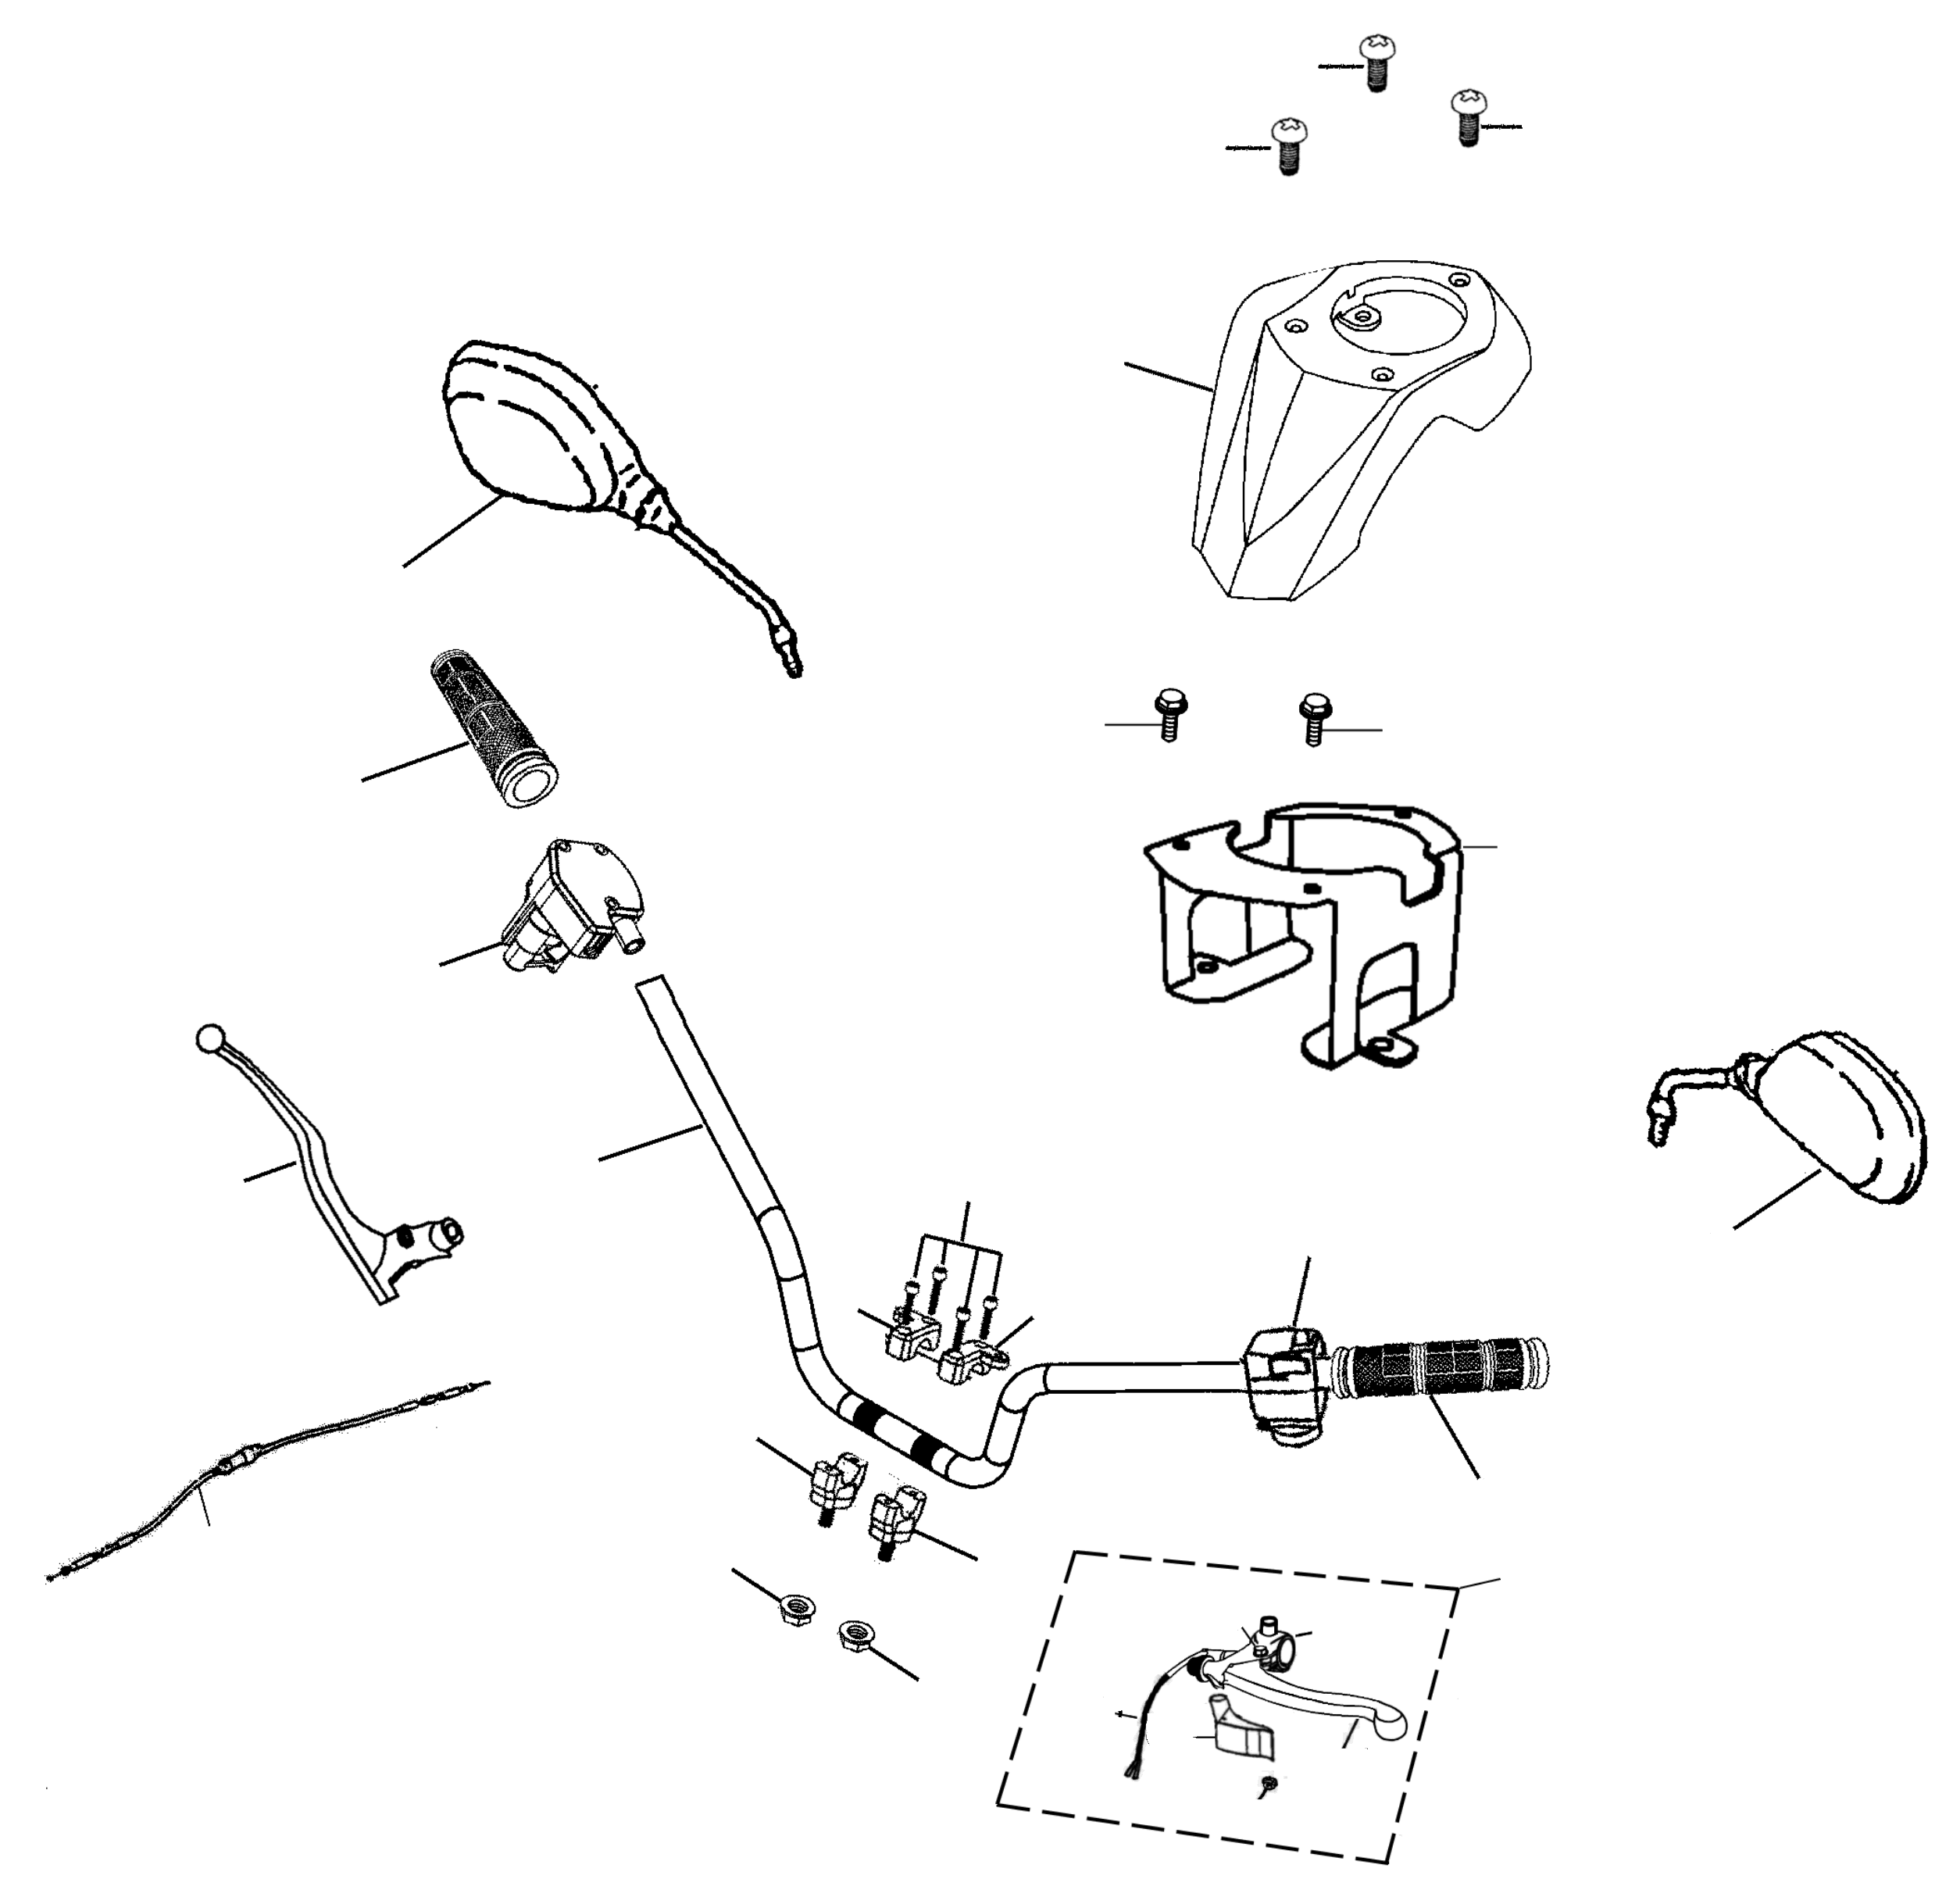 Lenker, Spiegel, Schalter, Hebel, Züge, Cockpit